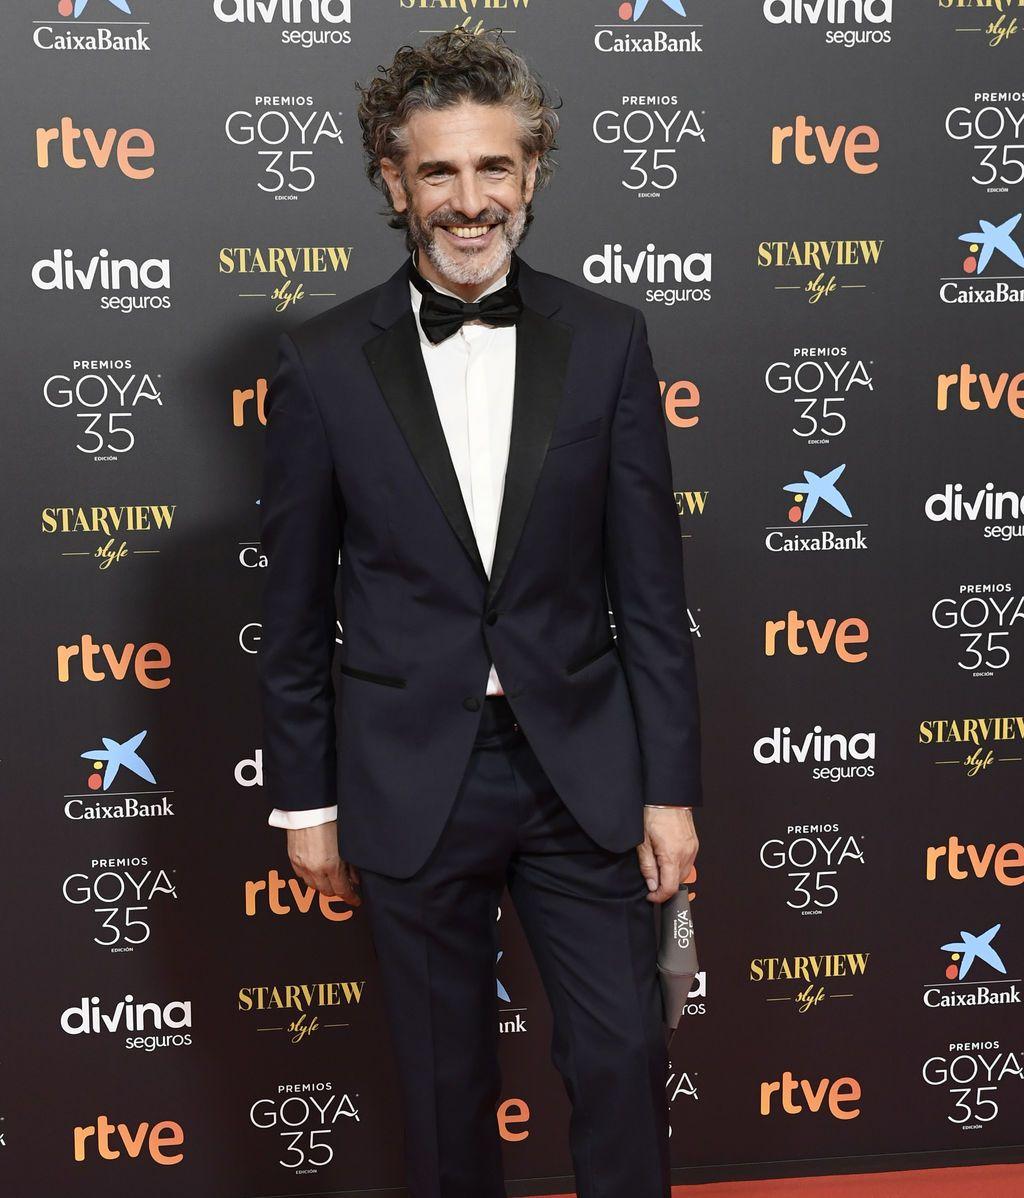 Leonardo Sbaraglia en la alfombra roja de los Premios Goya 2021